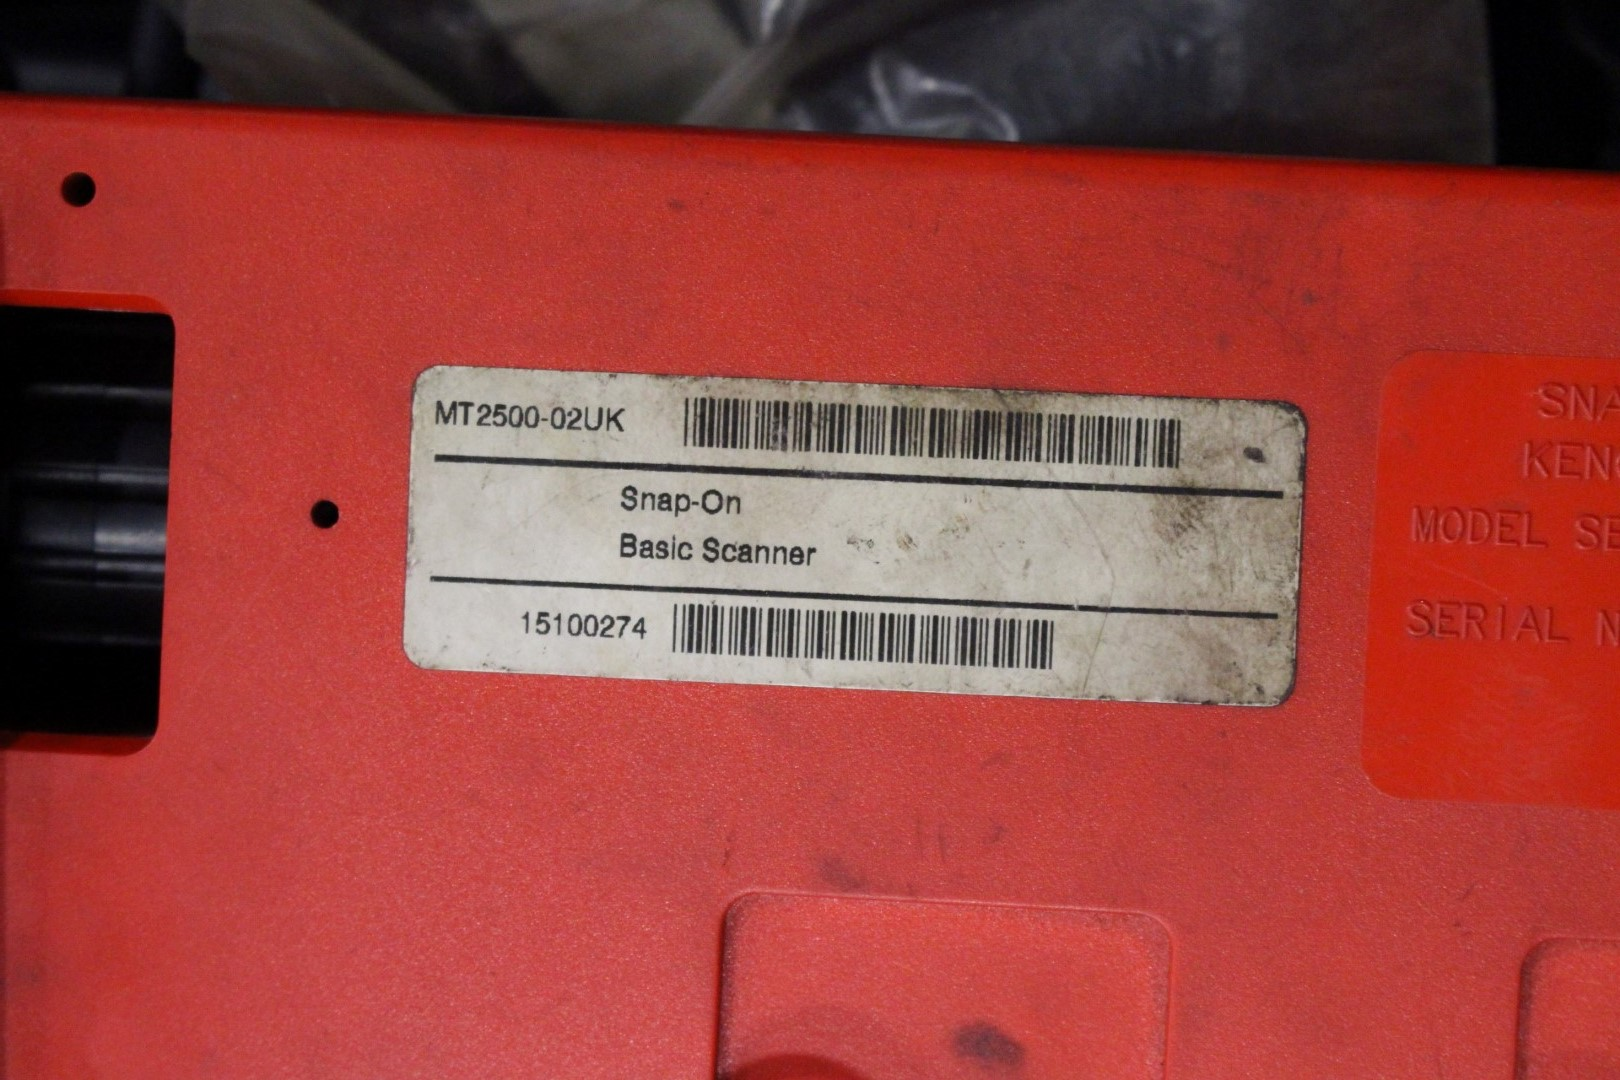 Diagnostic tool for car, Snap on diagnostic scanner, MT2500 - PS